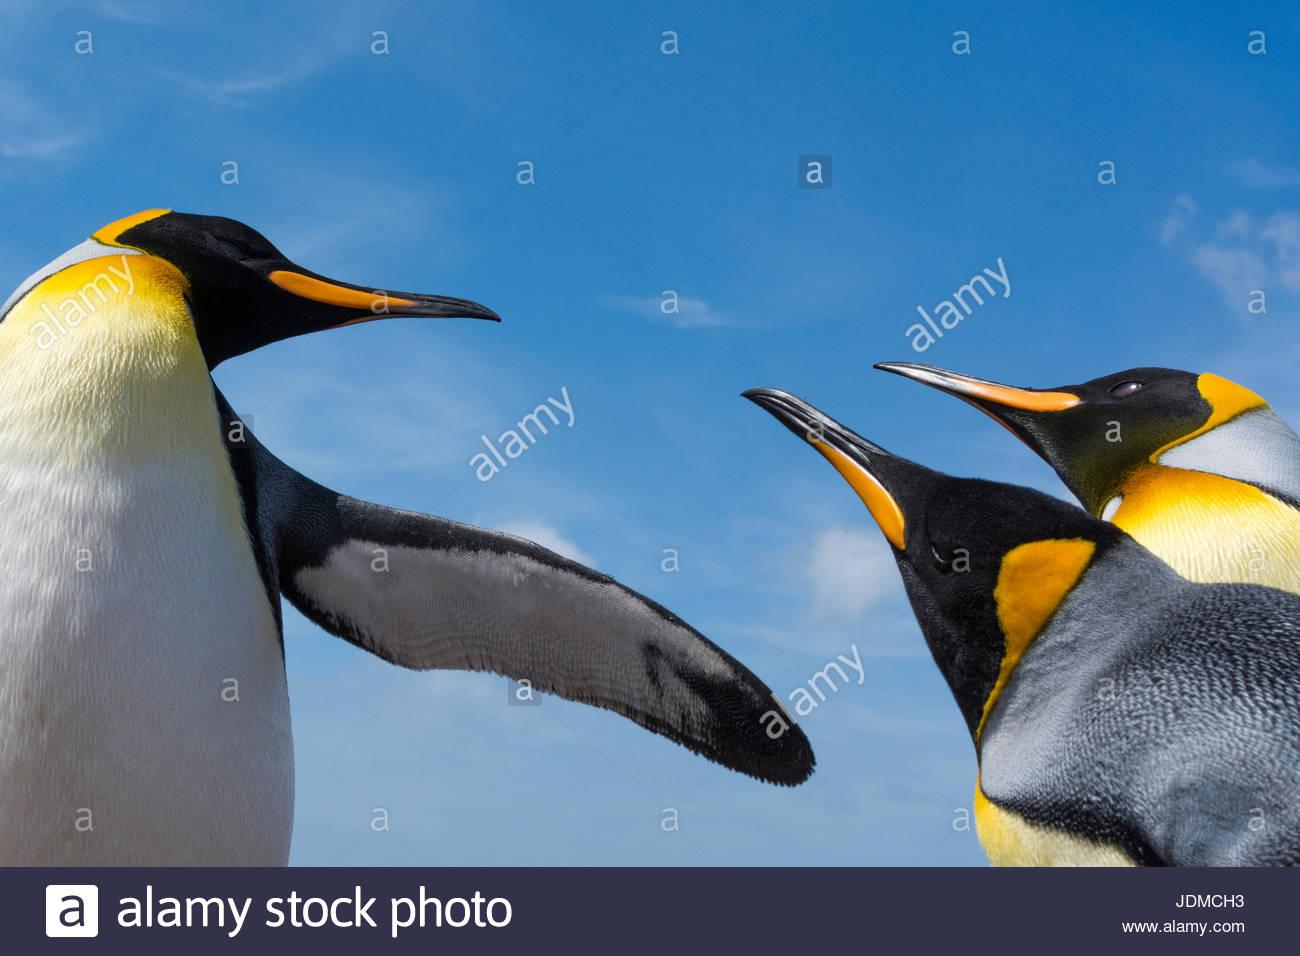 King penguins, Aptenodytes patagonica, fighting. - Stock Image